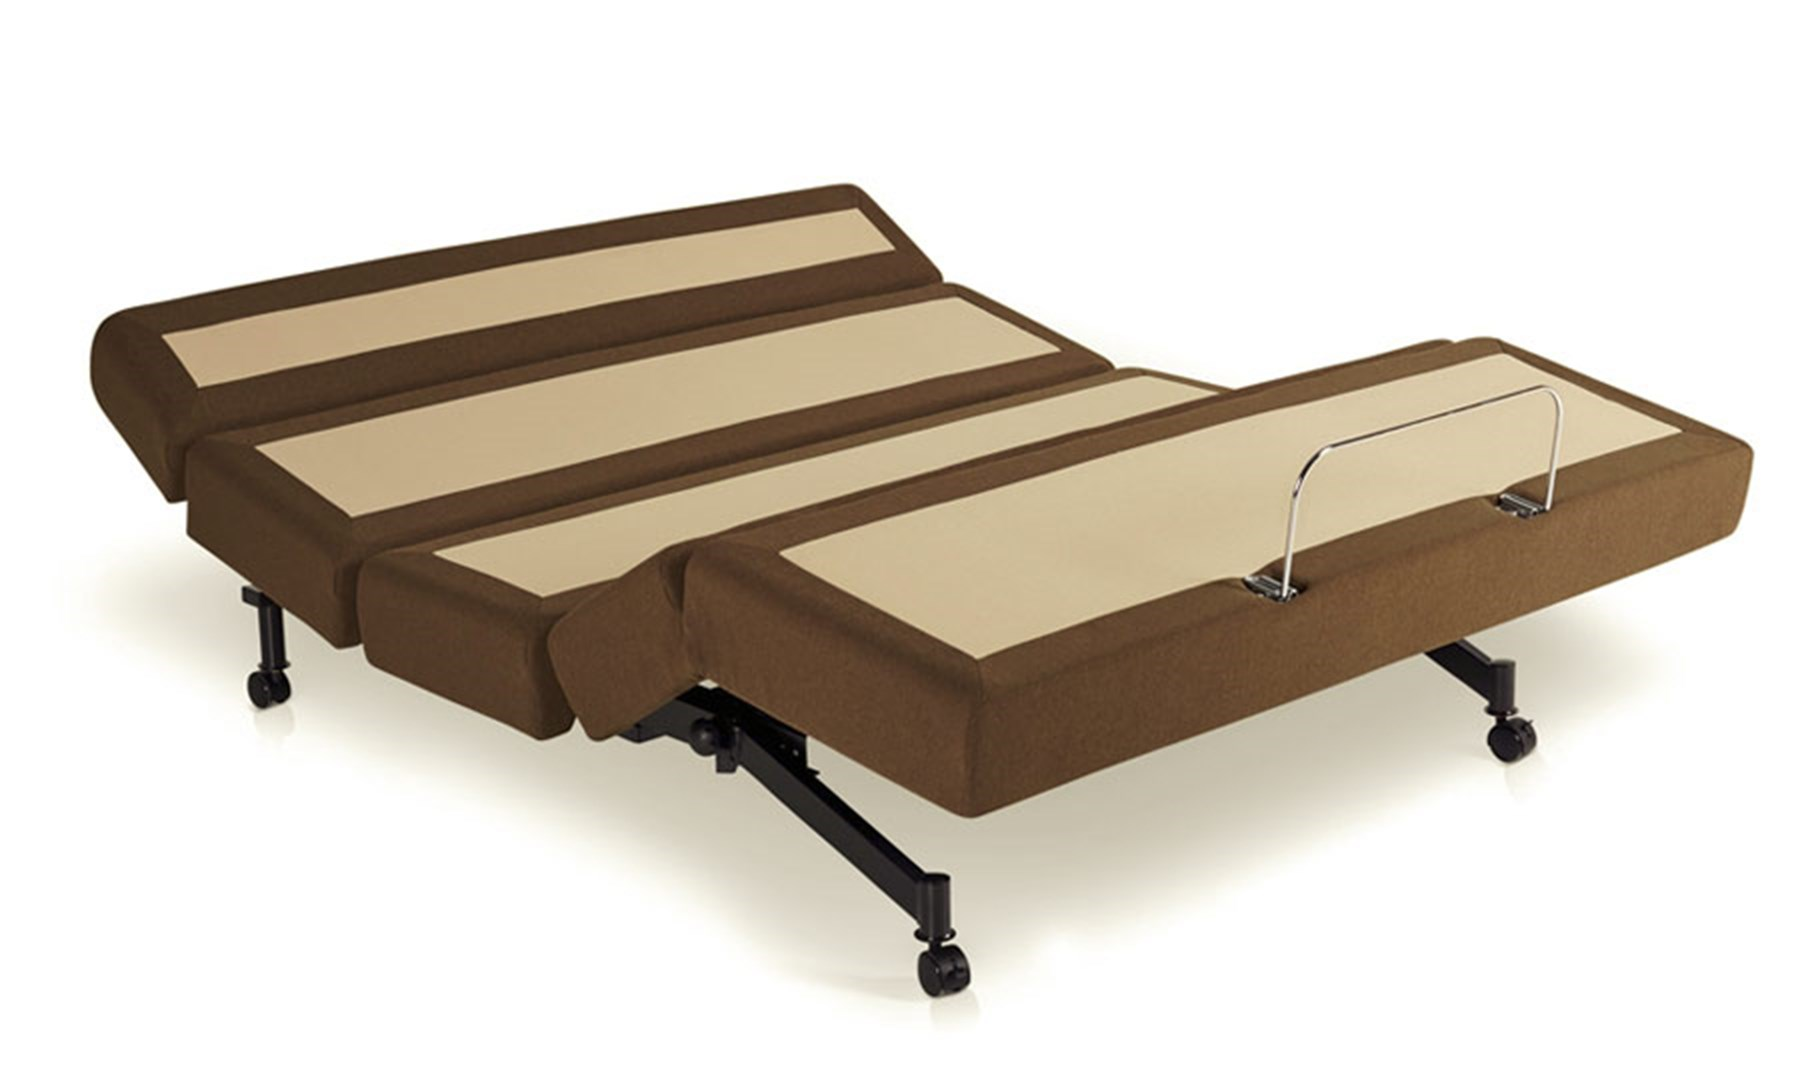 Mechanical Beds and Adjustable Bases - Mattress Folks